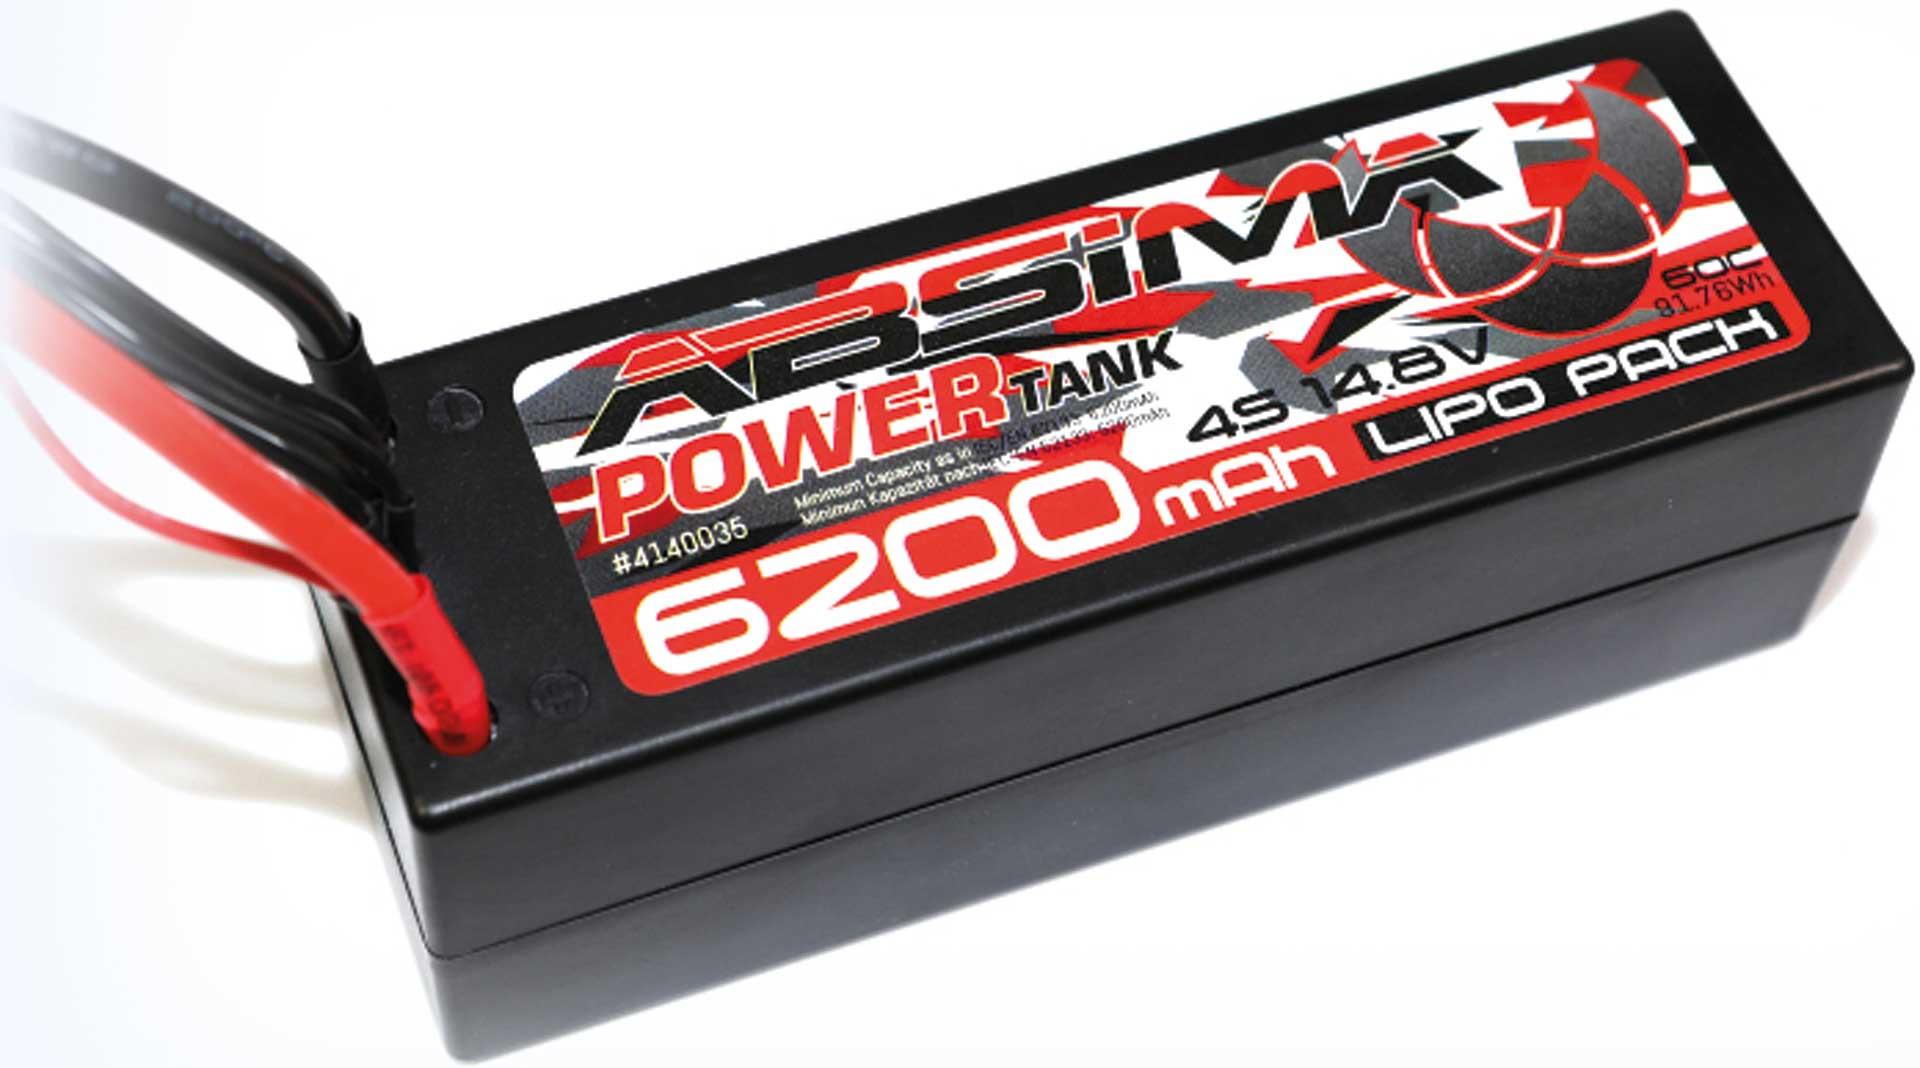 Absima Power Tank LiPo Stick Pack 14.8V-60C6200 Hardcase (XT90-Plug)